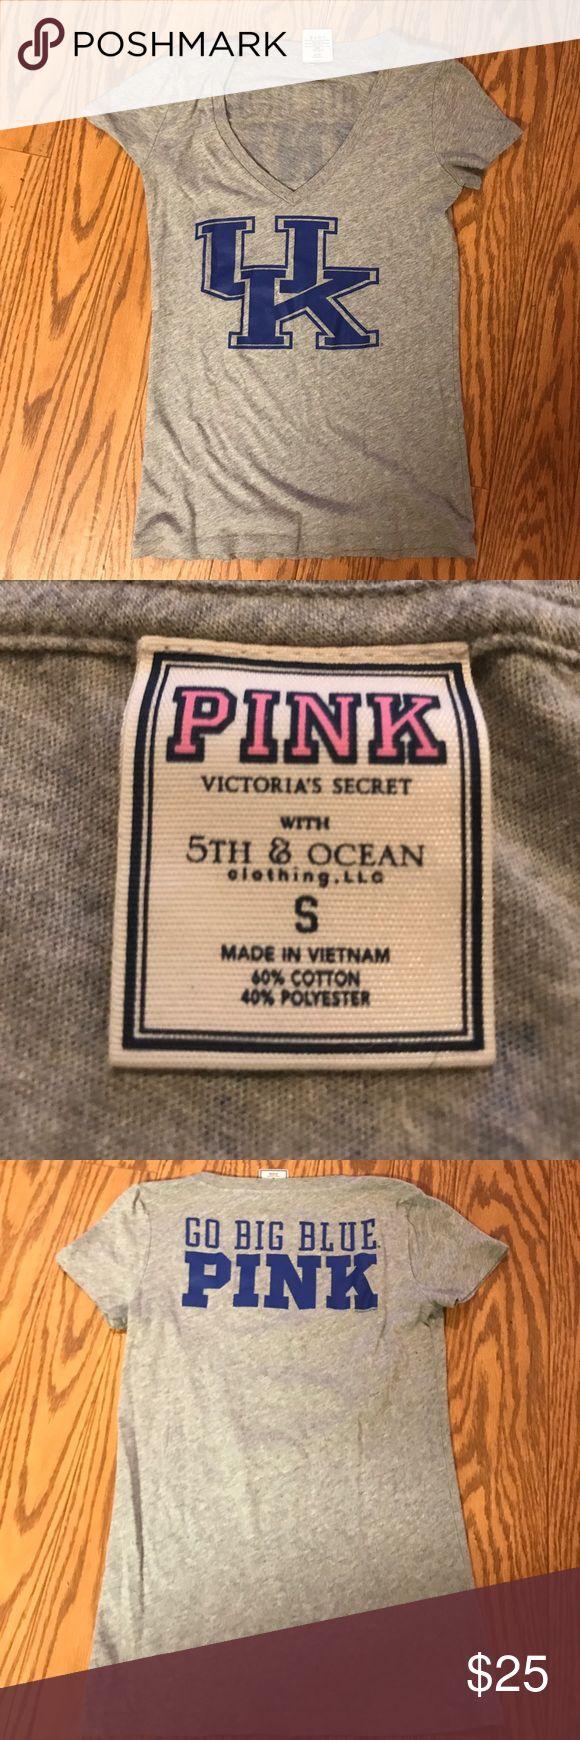 Victoria Secret Pink V Neck T Shirt UK Wildcats Gray v neck tshirt from Victoria secret pink. Has U.K. Wildcats logo on the front and go big blue PINK on the back. PINK Victoria's Secret Tops Tees - Short Sleeve